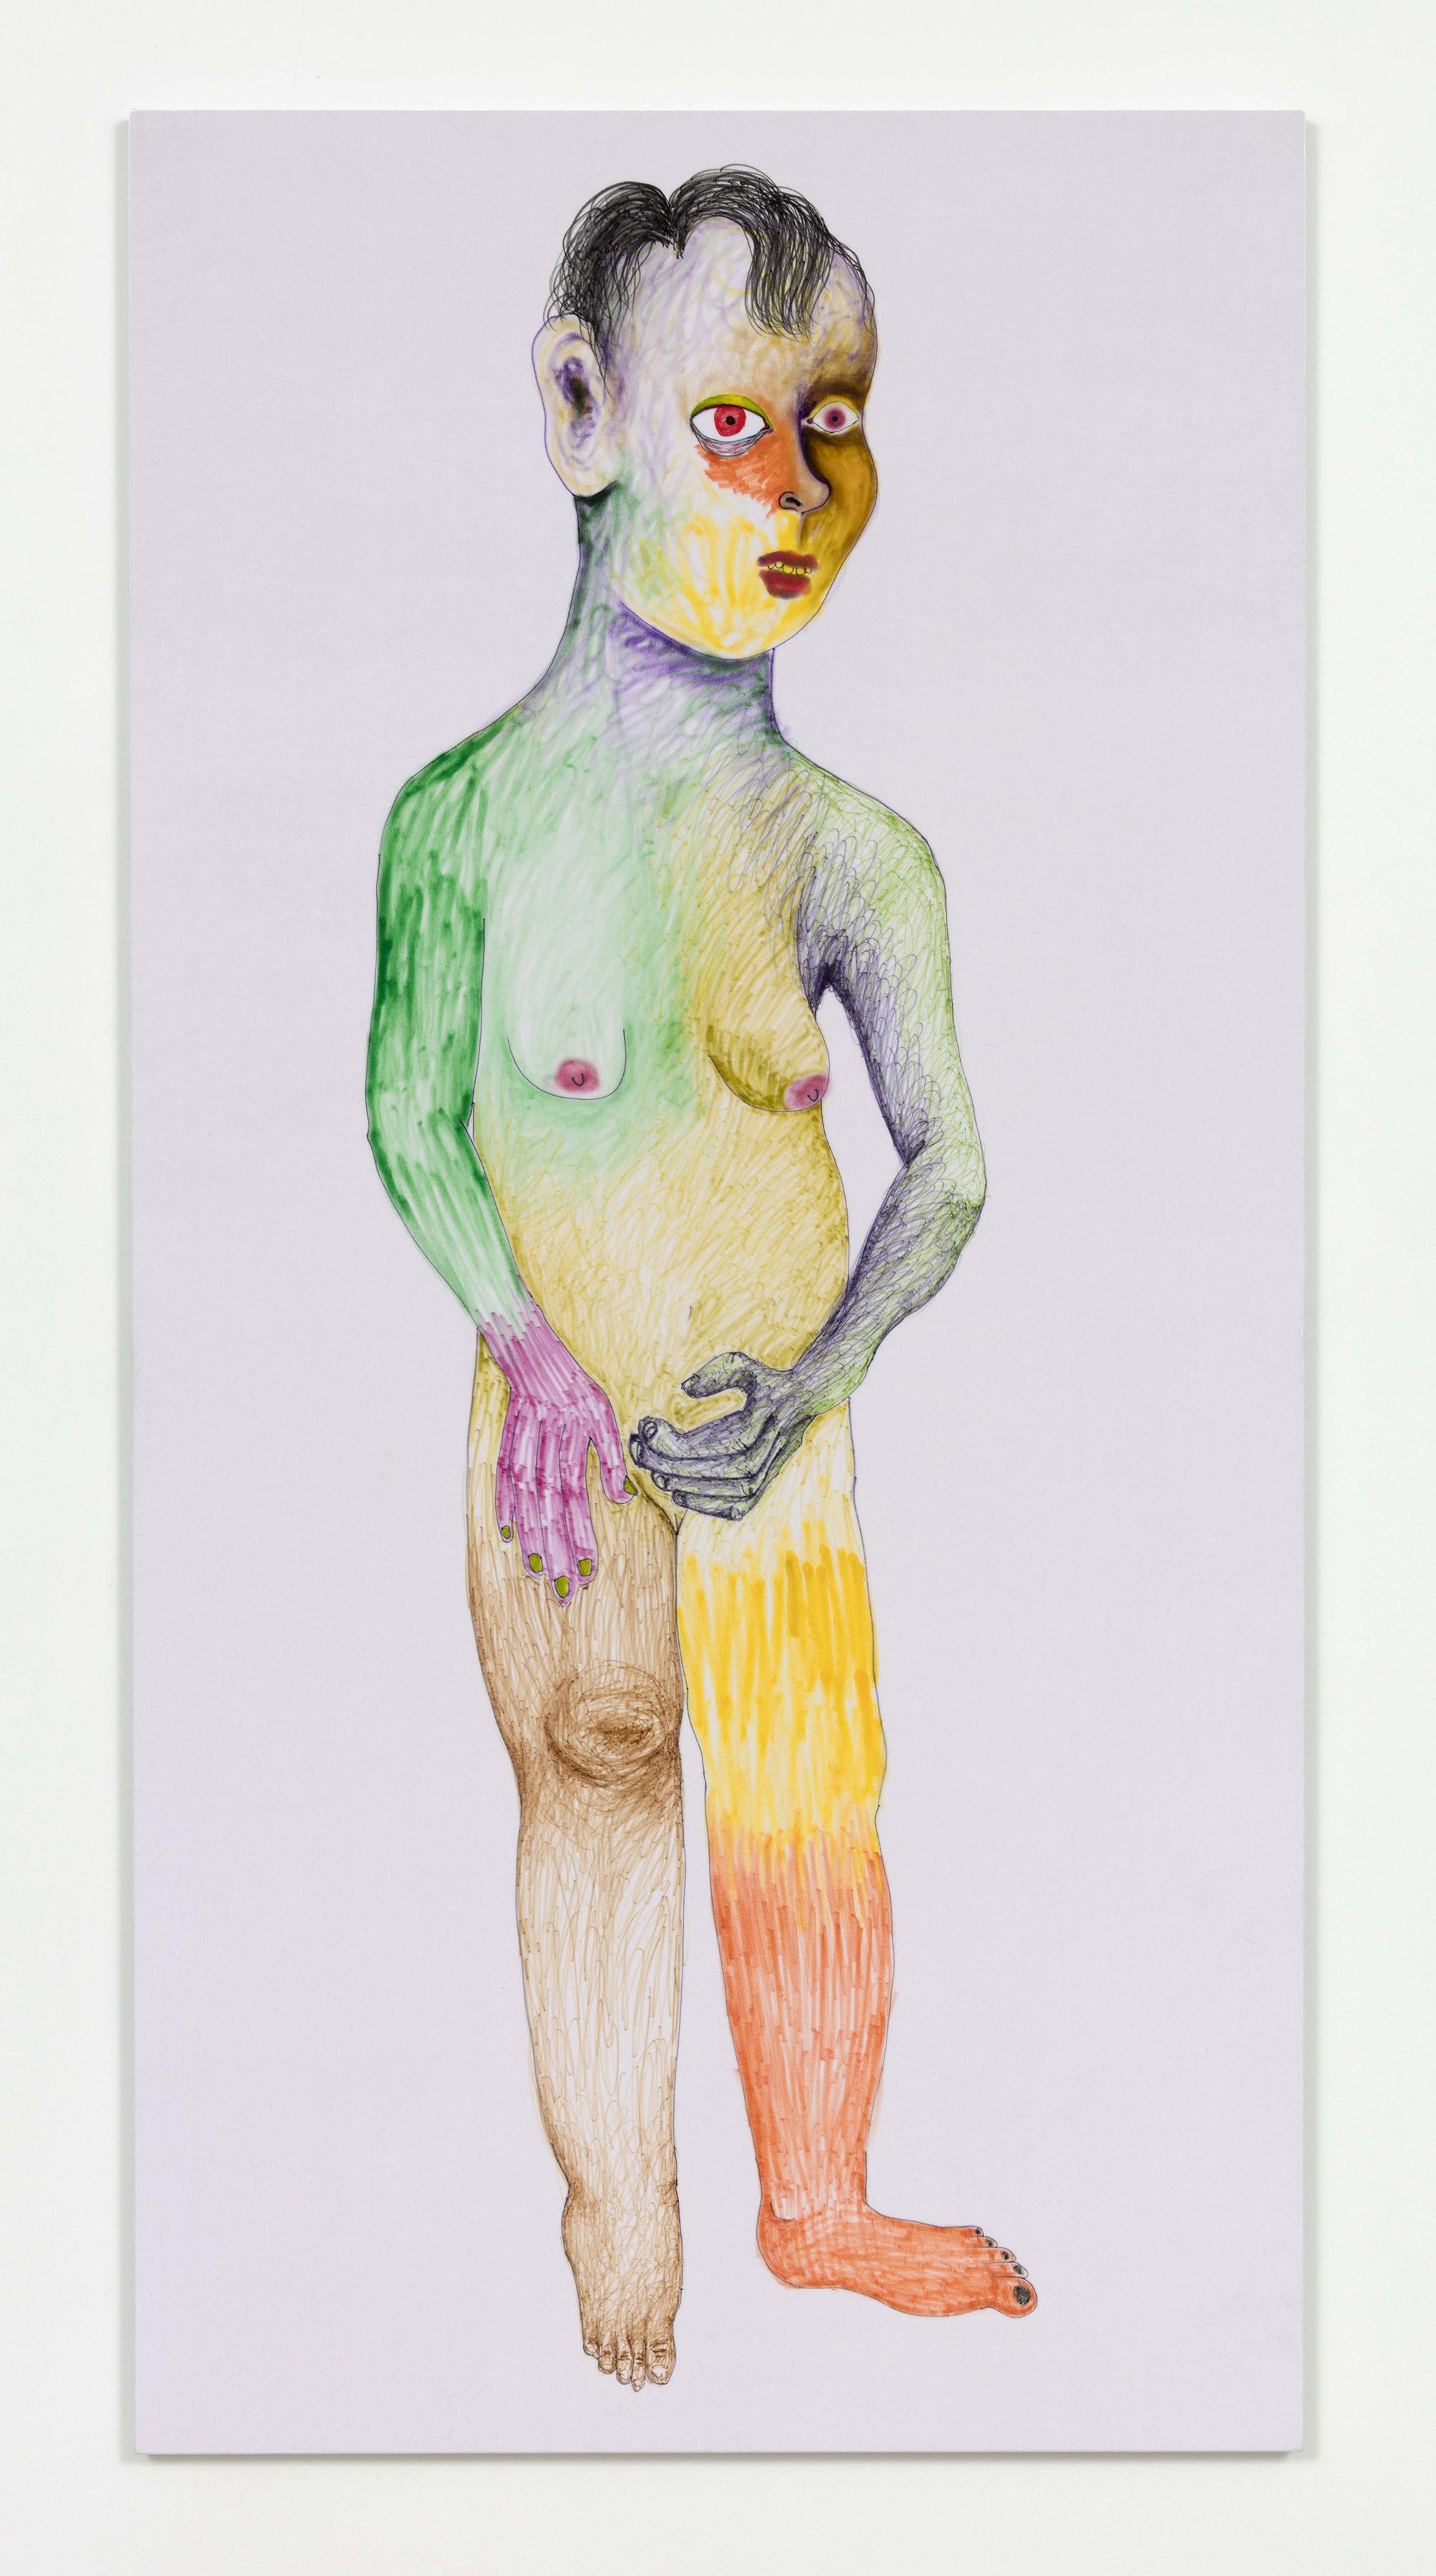 <em>Lev</em>, 2017. Fabric marker on velvet, 100 x 50 1/4 inches